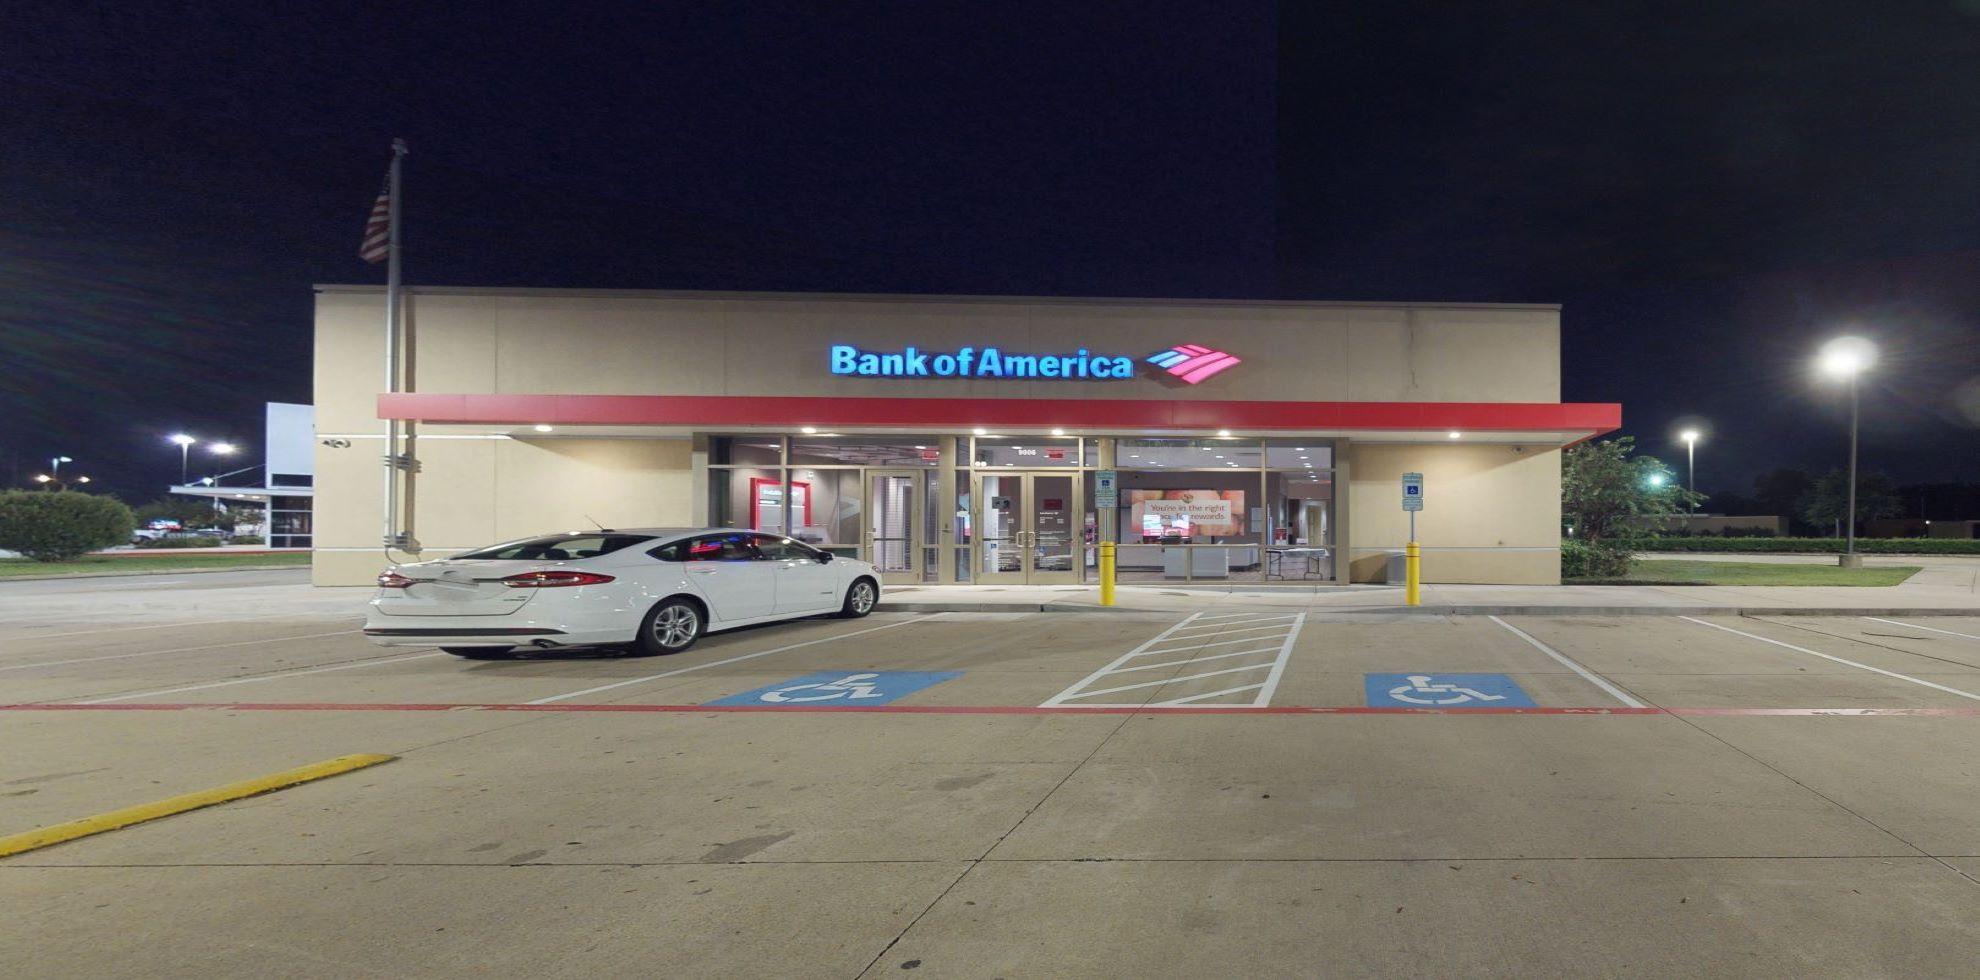 Bank of America financial center with drive-thru ATM | 9006 W Sam Houston Pkwy N, Houston, TX 77064